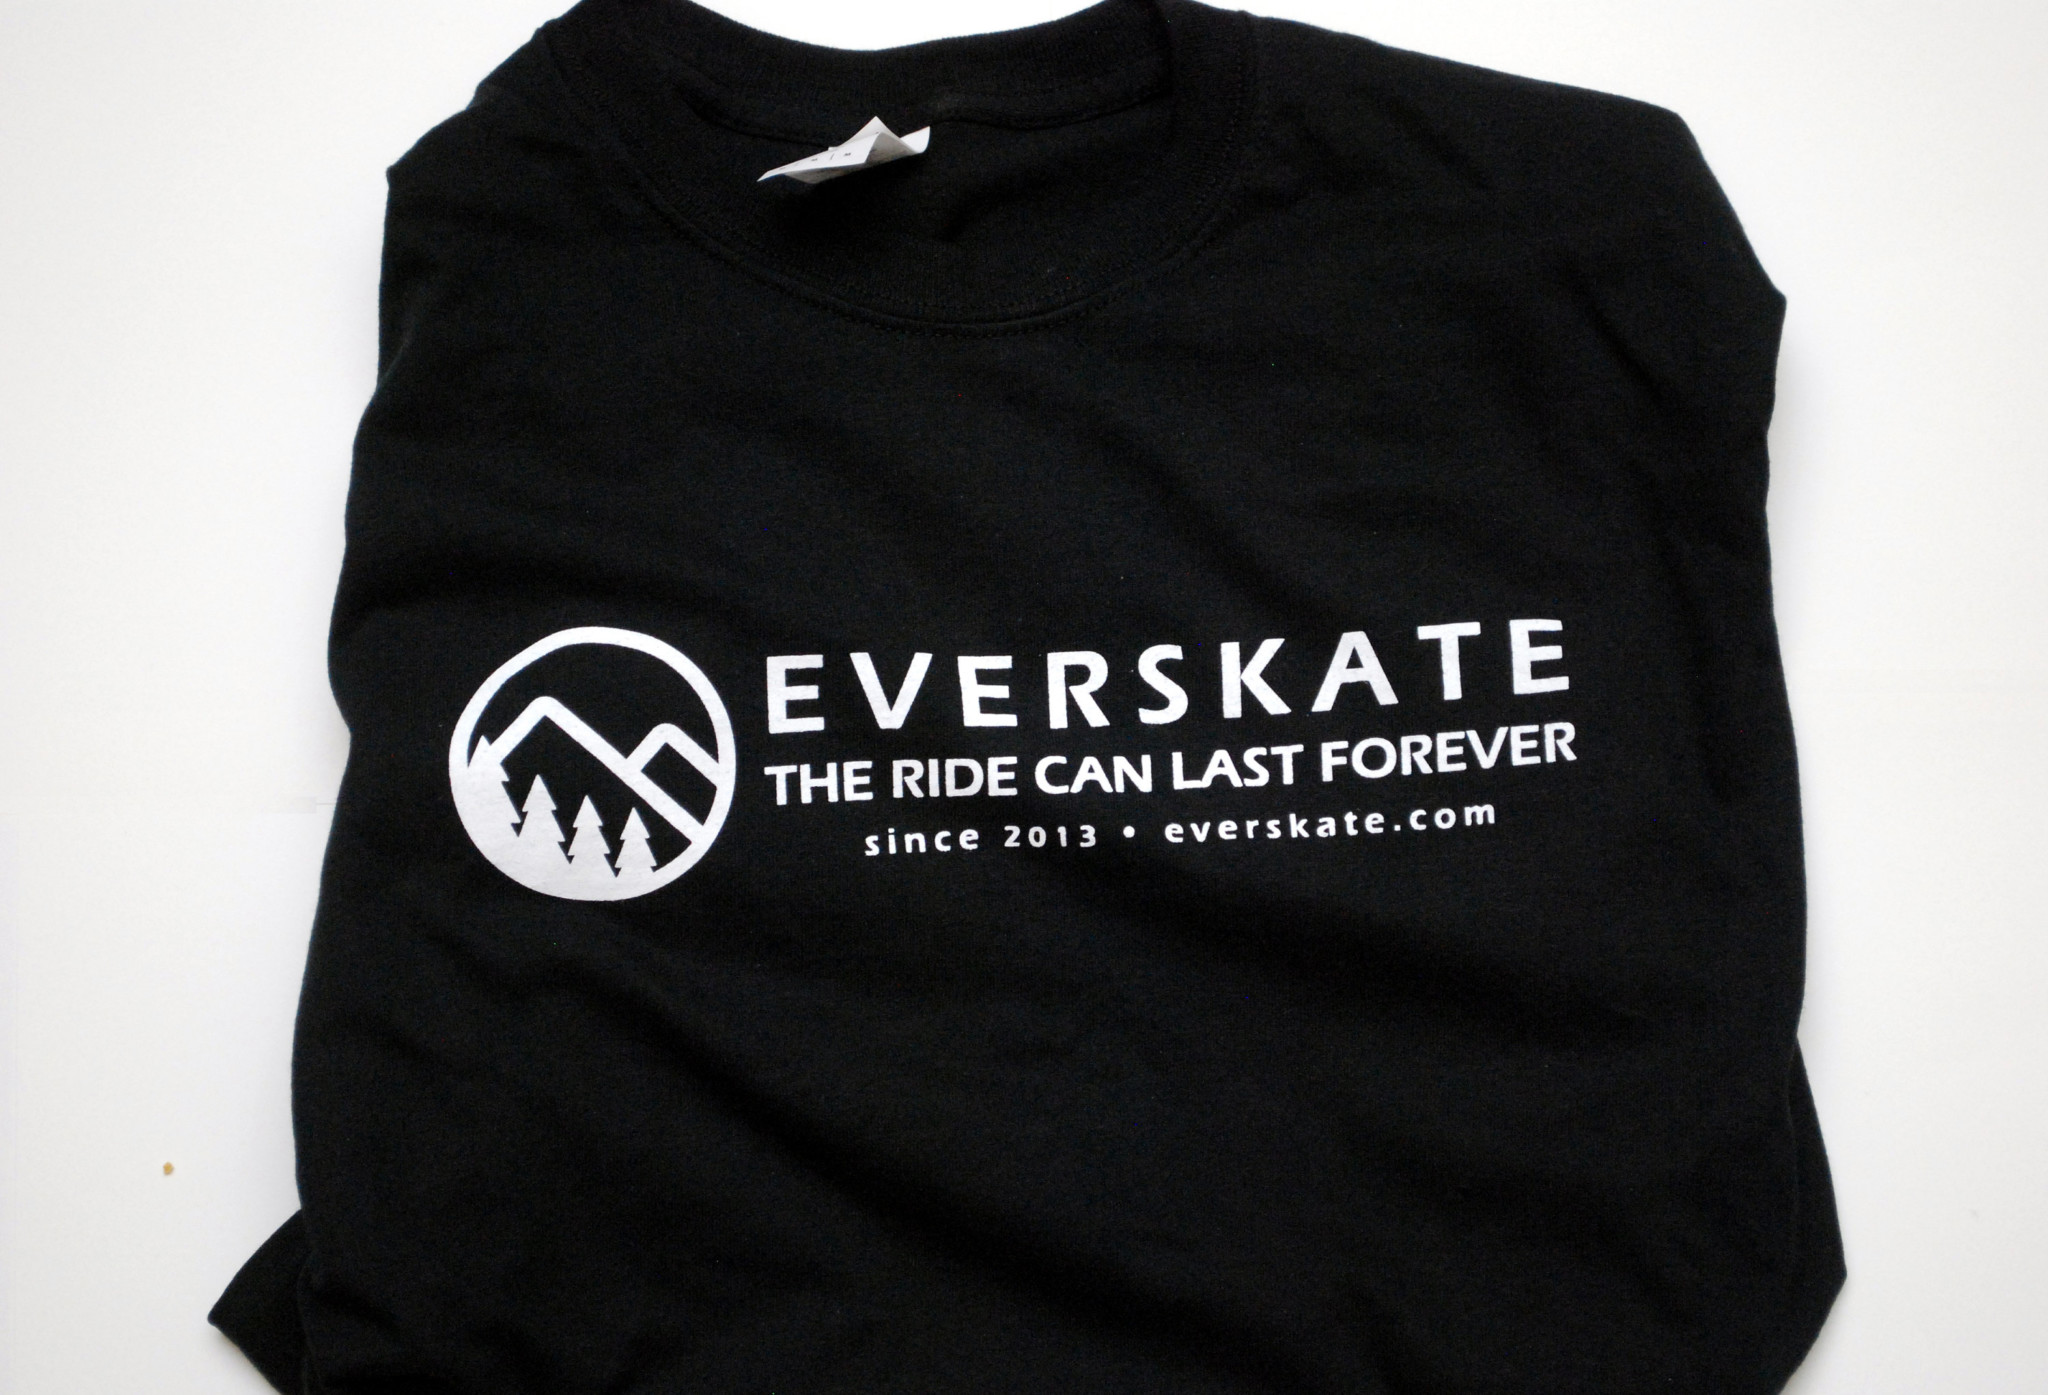 thrasher shirt, skateboard, shirt, clothes